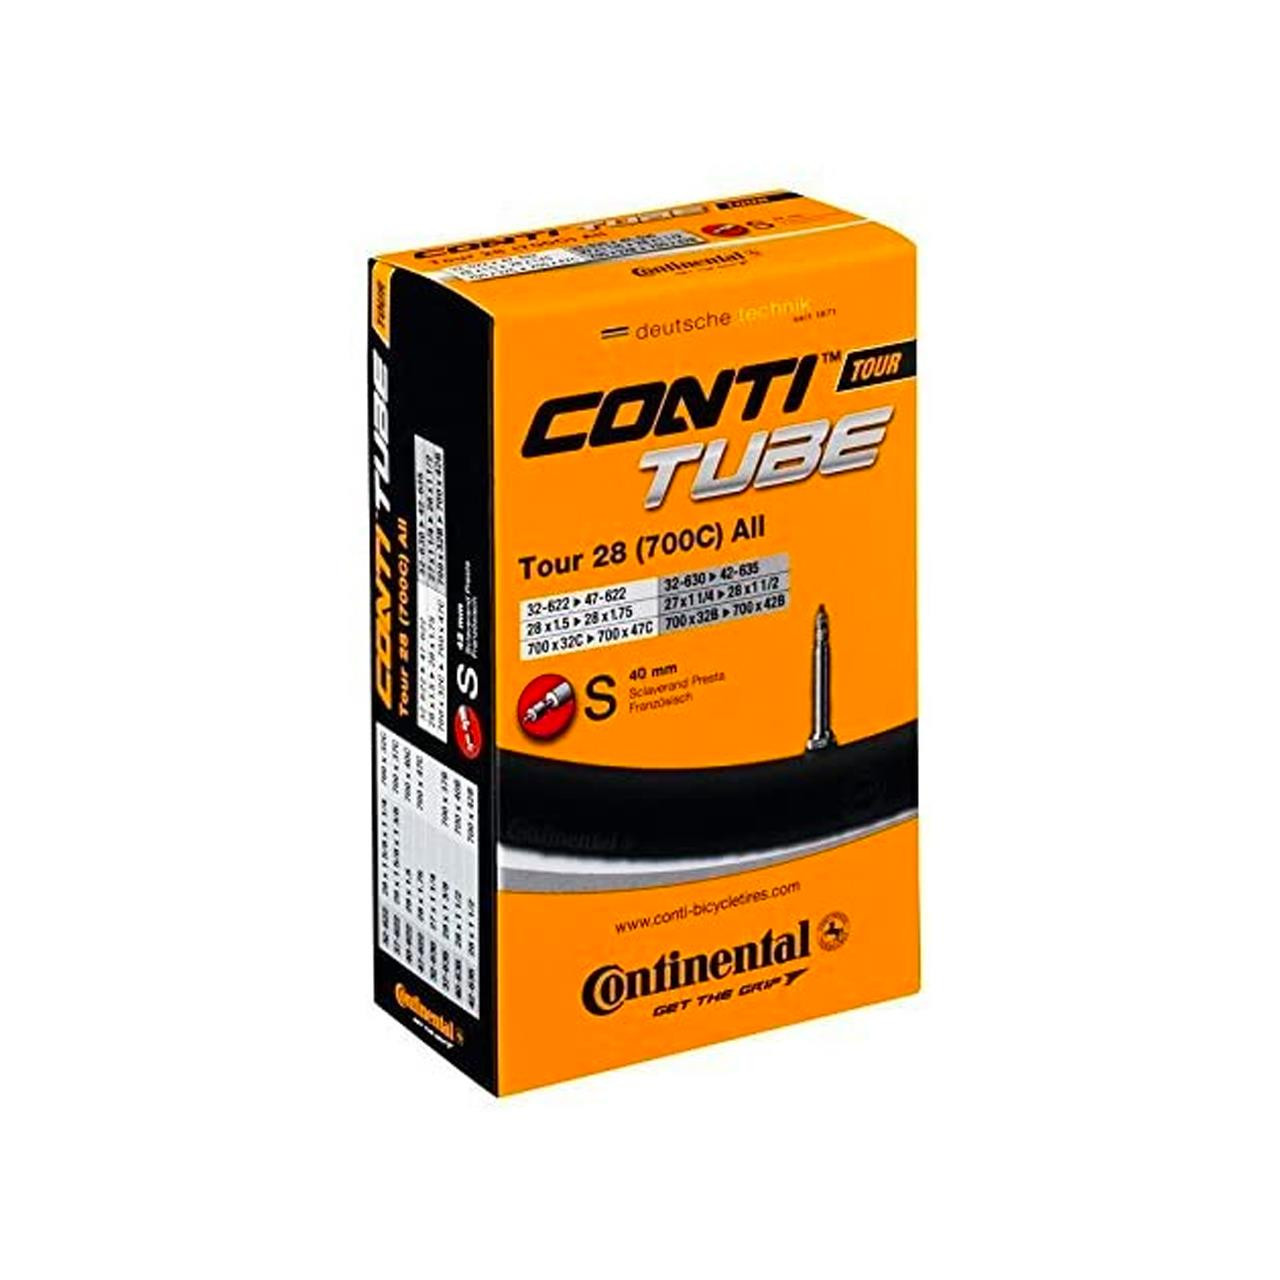 Continental Tour 28 (700 x 32c - 47c, Presta 60mm)